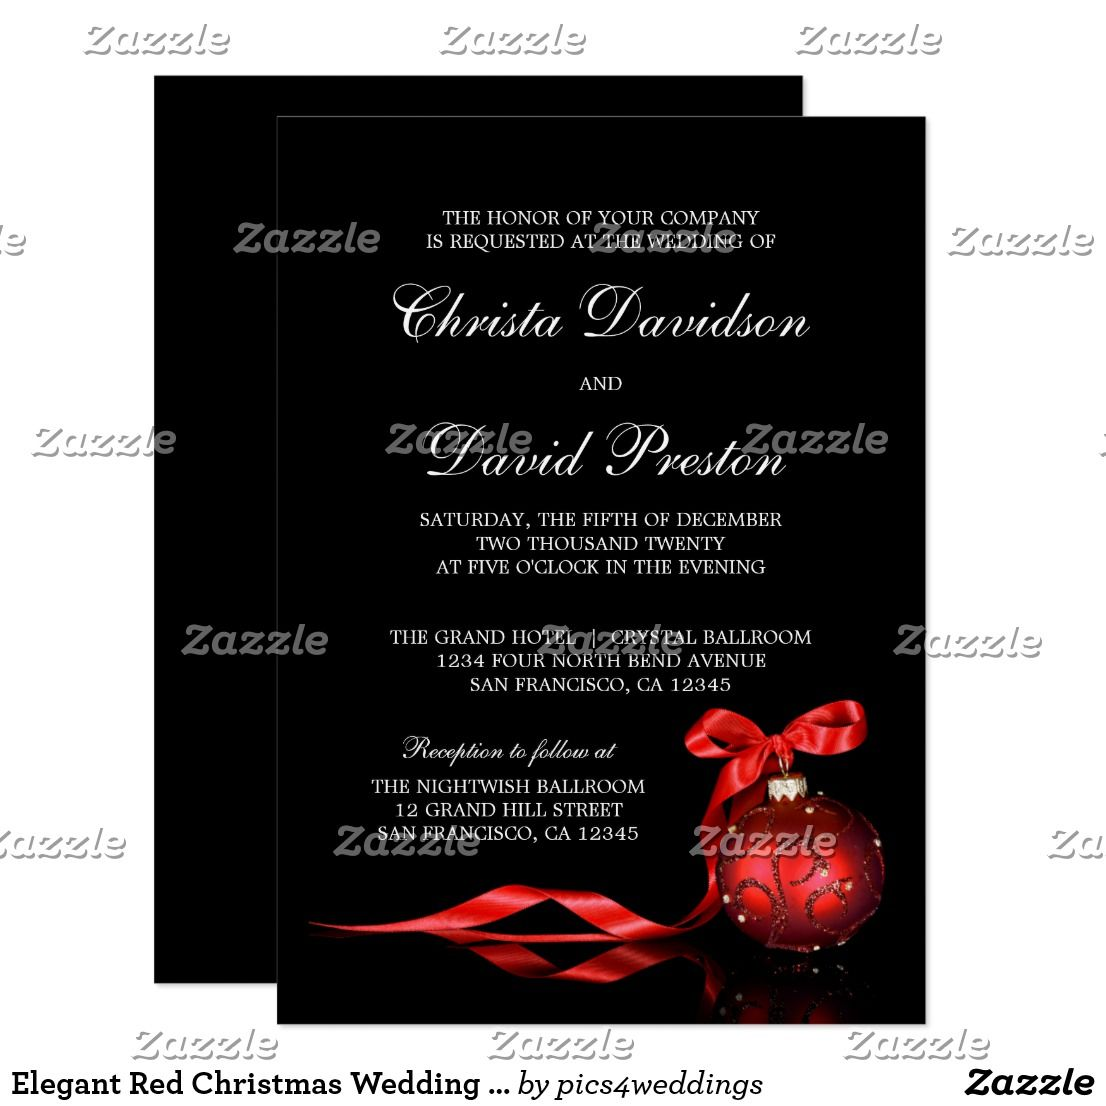 Elegant Red Christmas Wedding Invitations Template